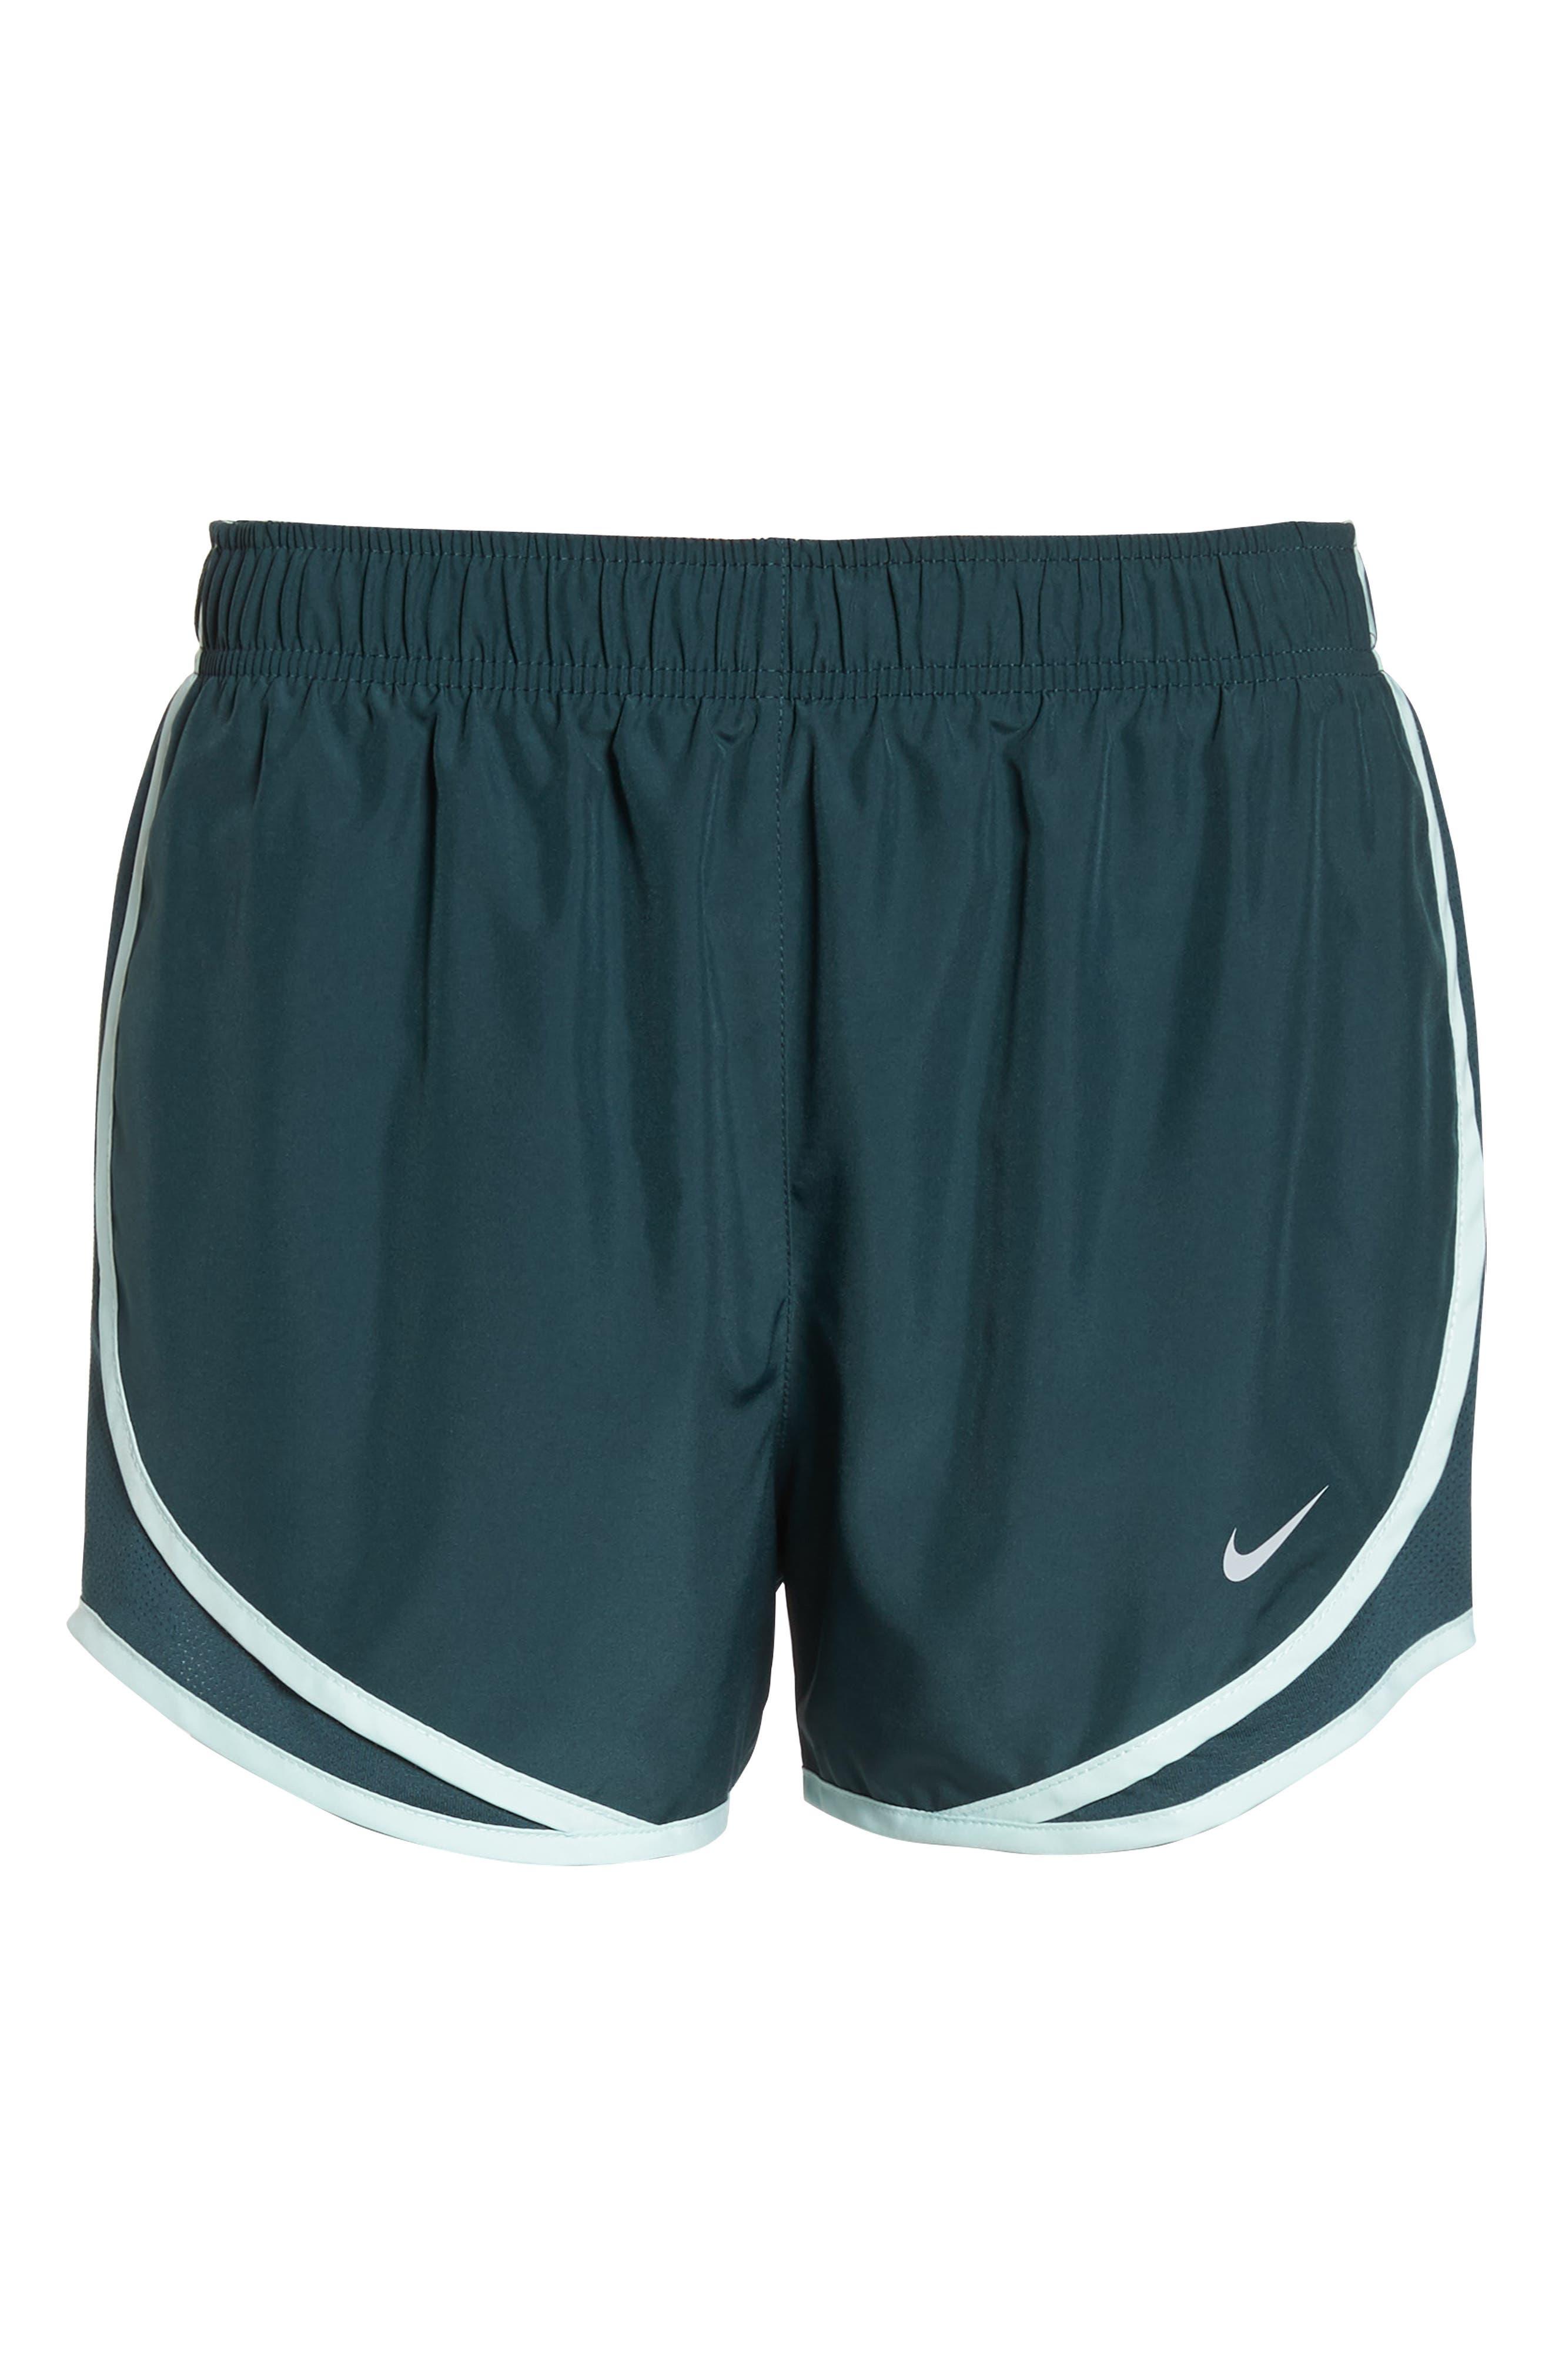 Dry Tempo Running Shorts,                             Alternate thumbnail 433, color,